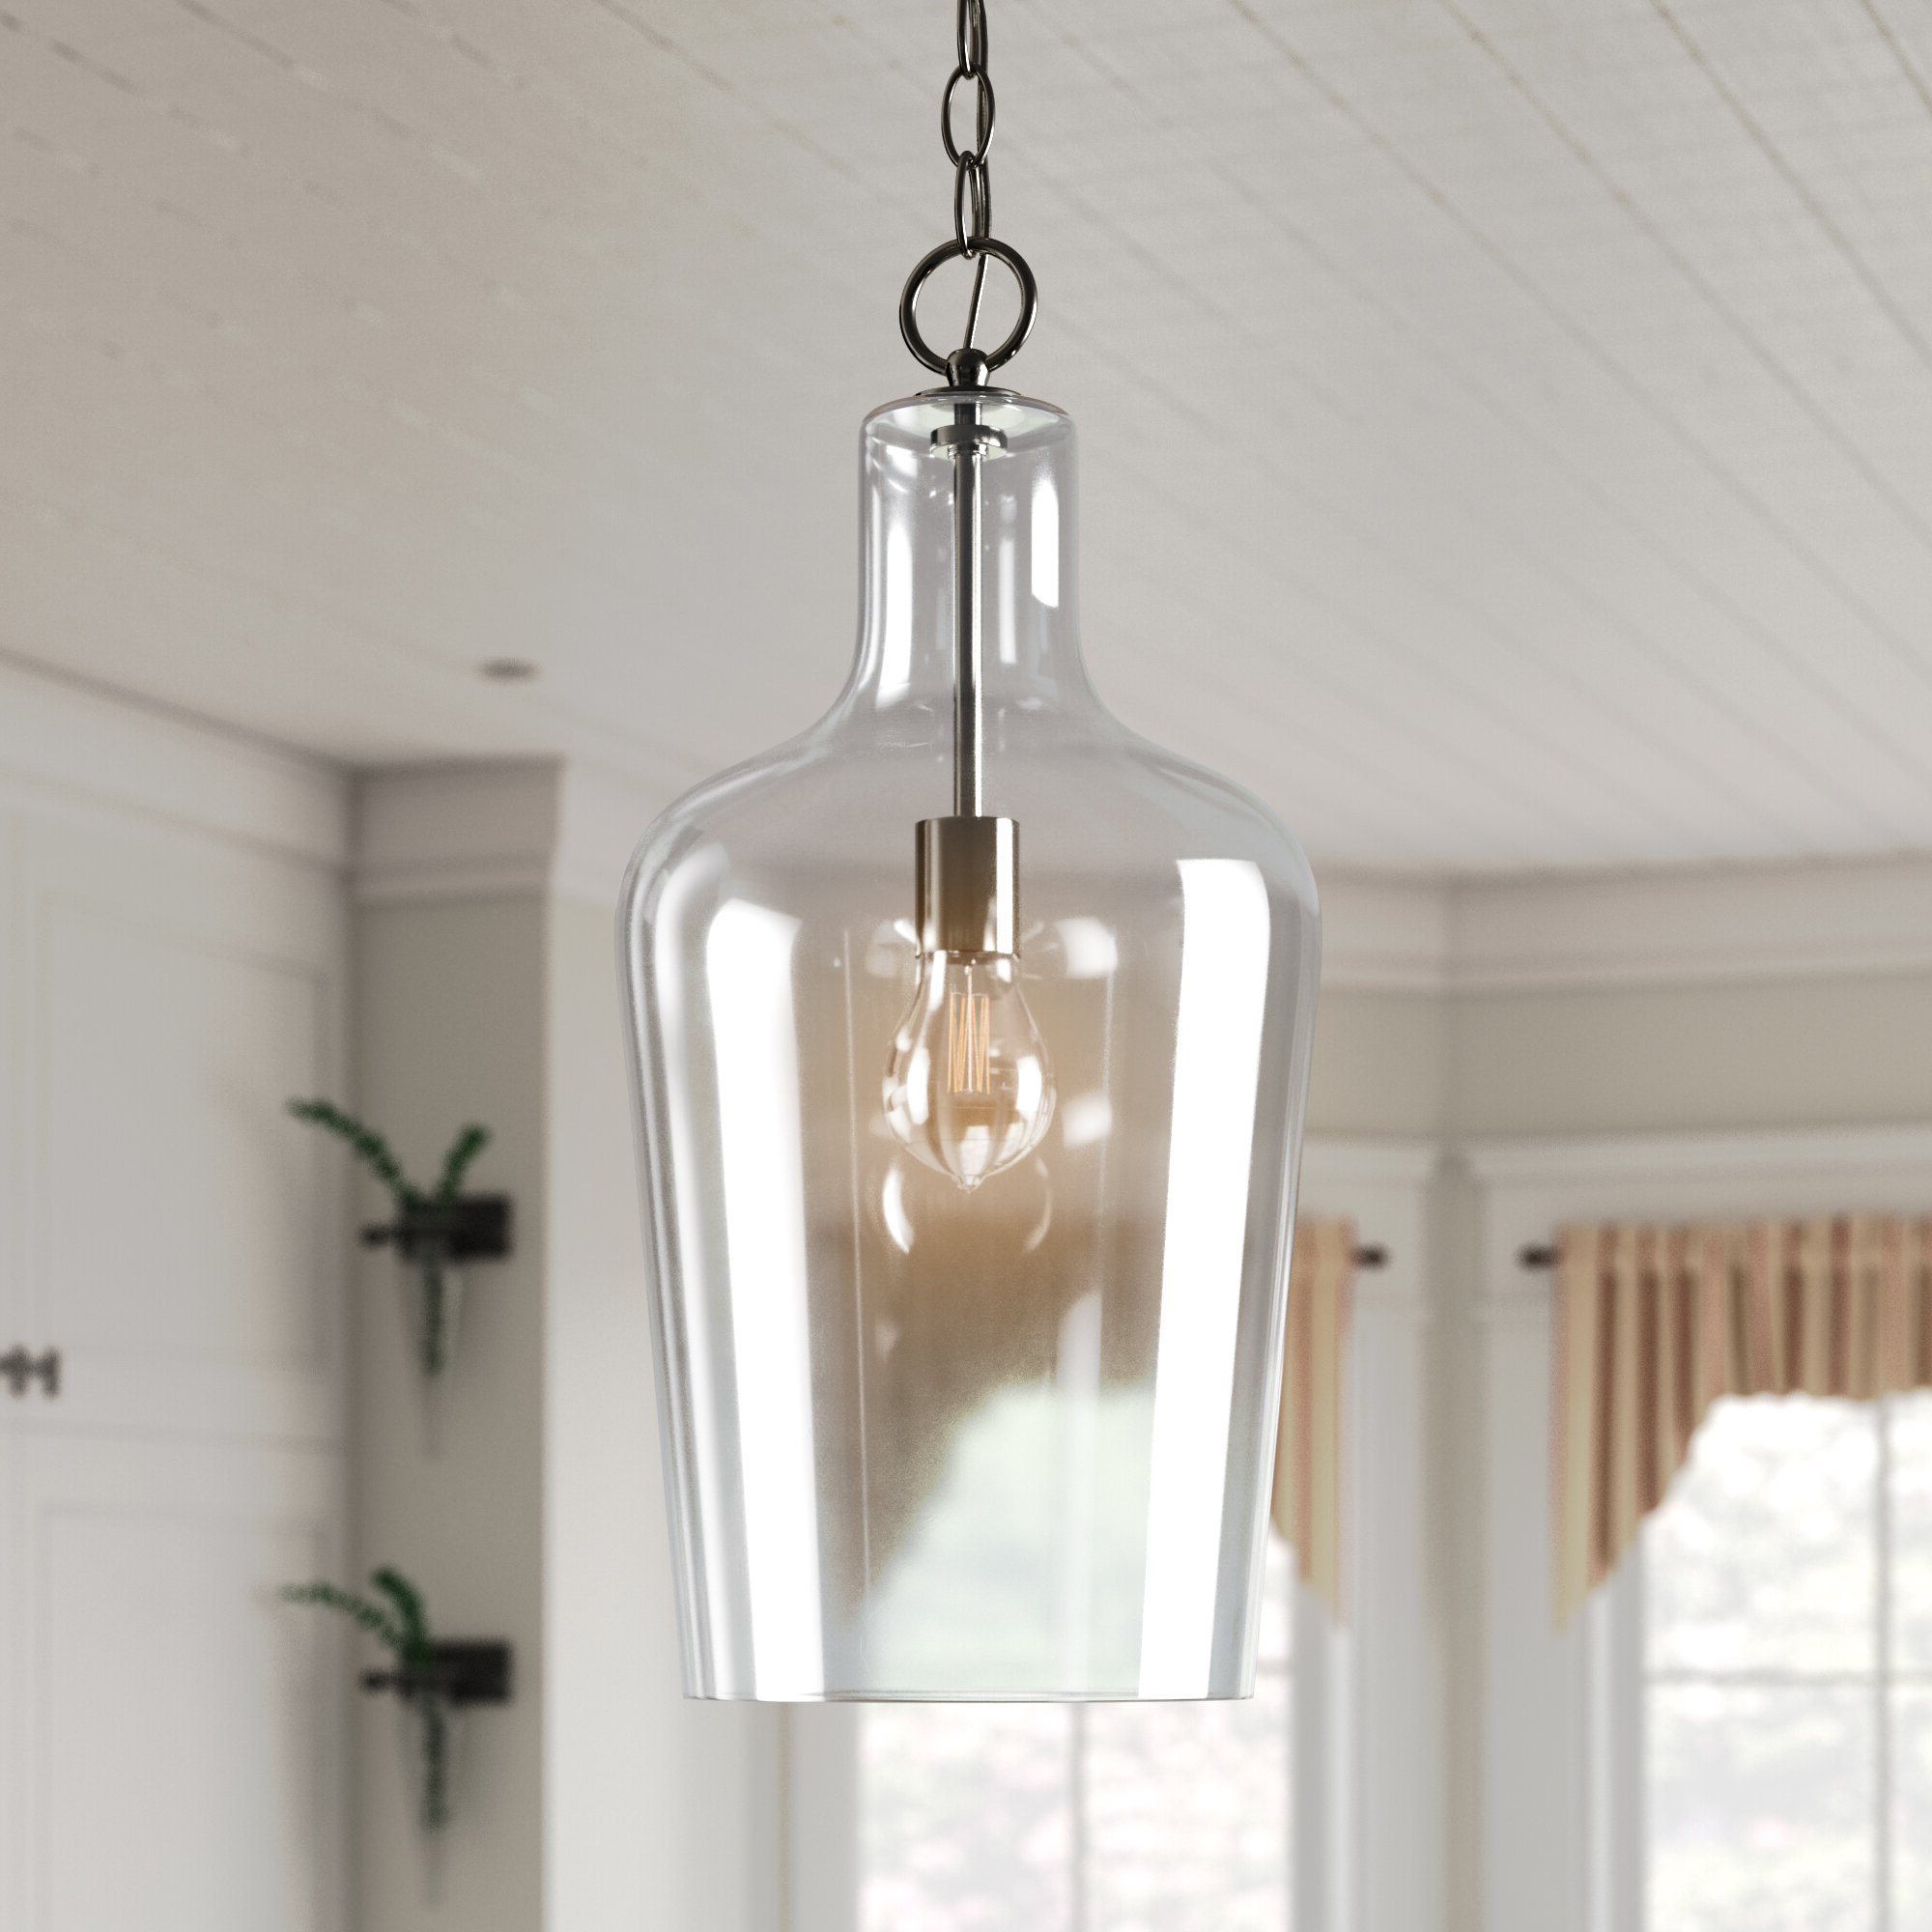 Laurel Foundry Modern Farmhouse Carey 1 Light Single Bell Pendant Regarding Well Liked Clematite 1 Light Single Jar Pendants (View 20 of 25)